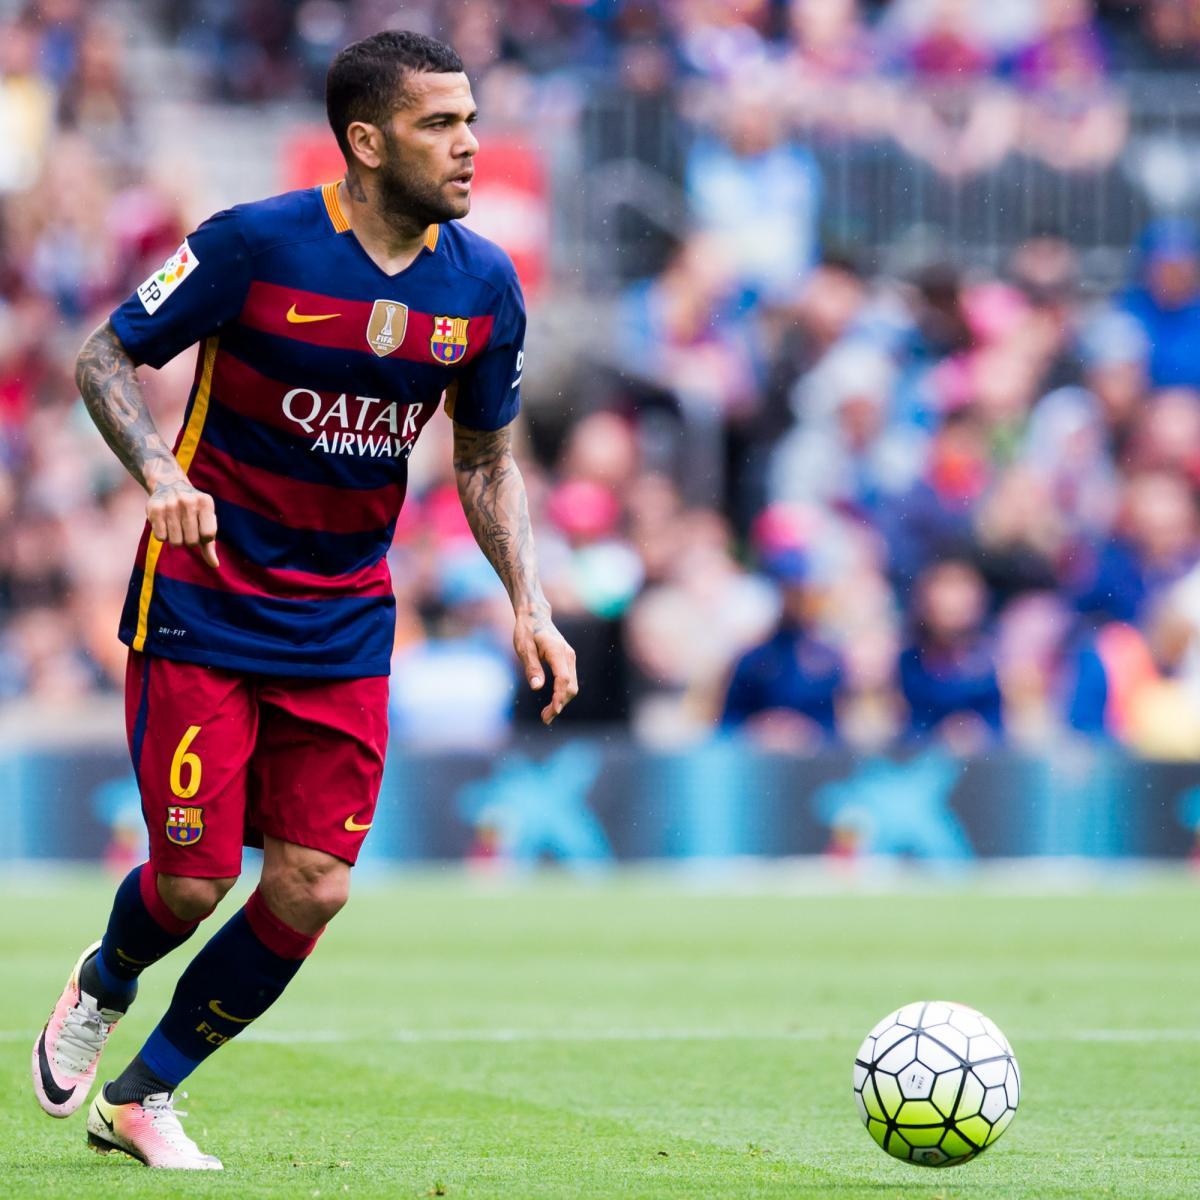 Arsenal Vs Barcelona Live Score Highlights From: Granada Vs. Barcelona: Live Score, Highlights From La Liga